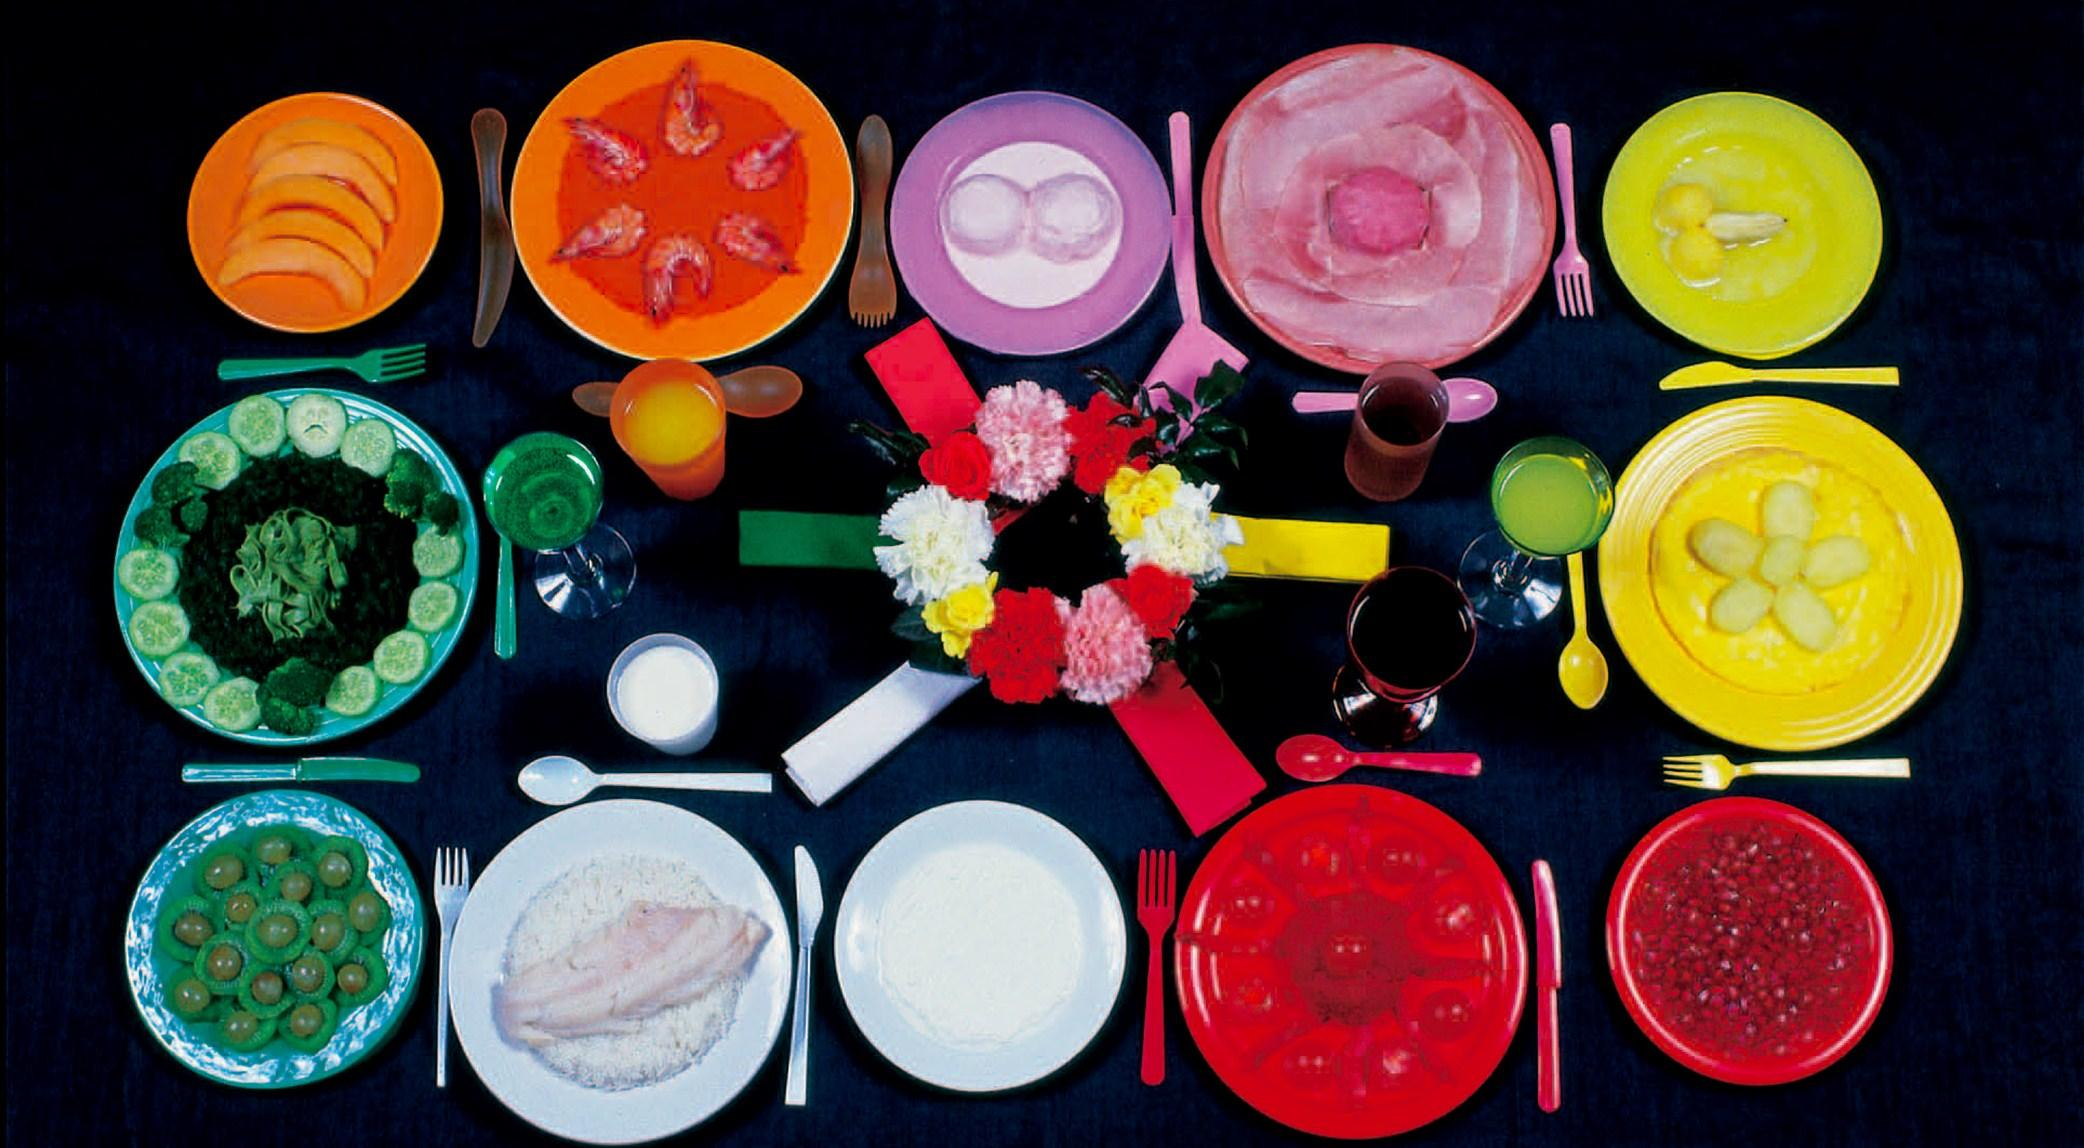 Mostra-Gola-Triennale-CALLE-Chromatic-Diet--Dimanche-o-r-b-v-j-rose-